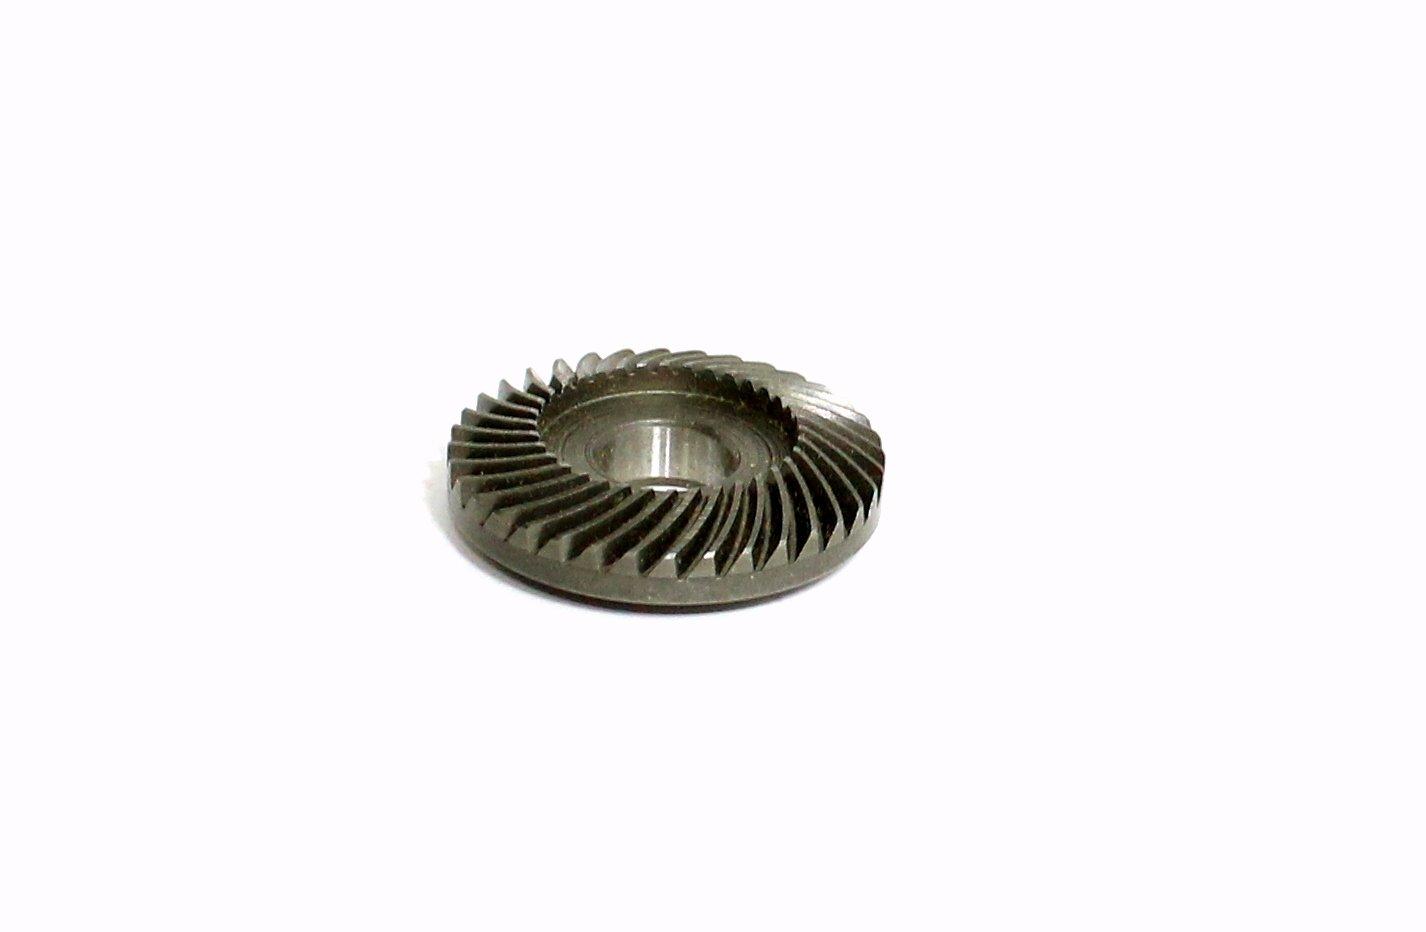 Bosch Parts 3606333035 Bevel Gear 36 Teeth